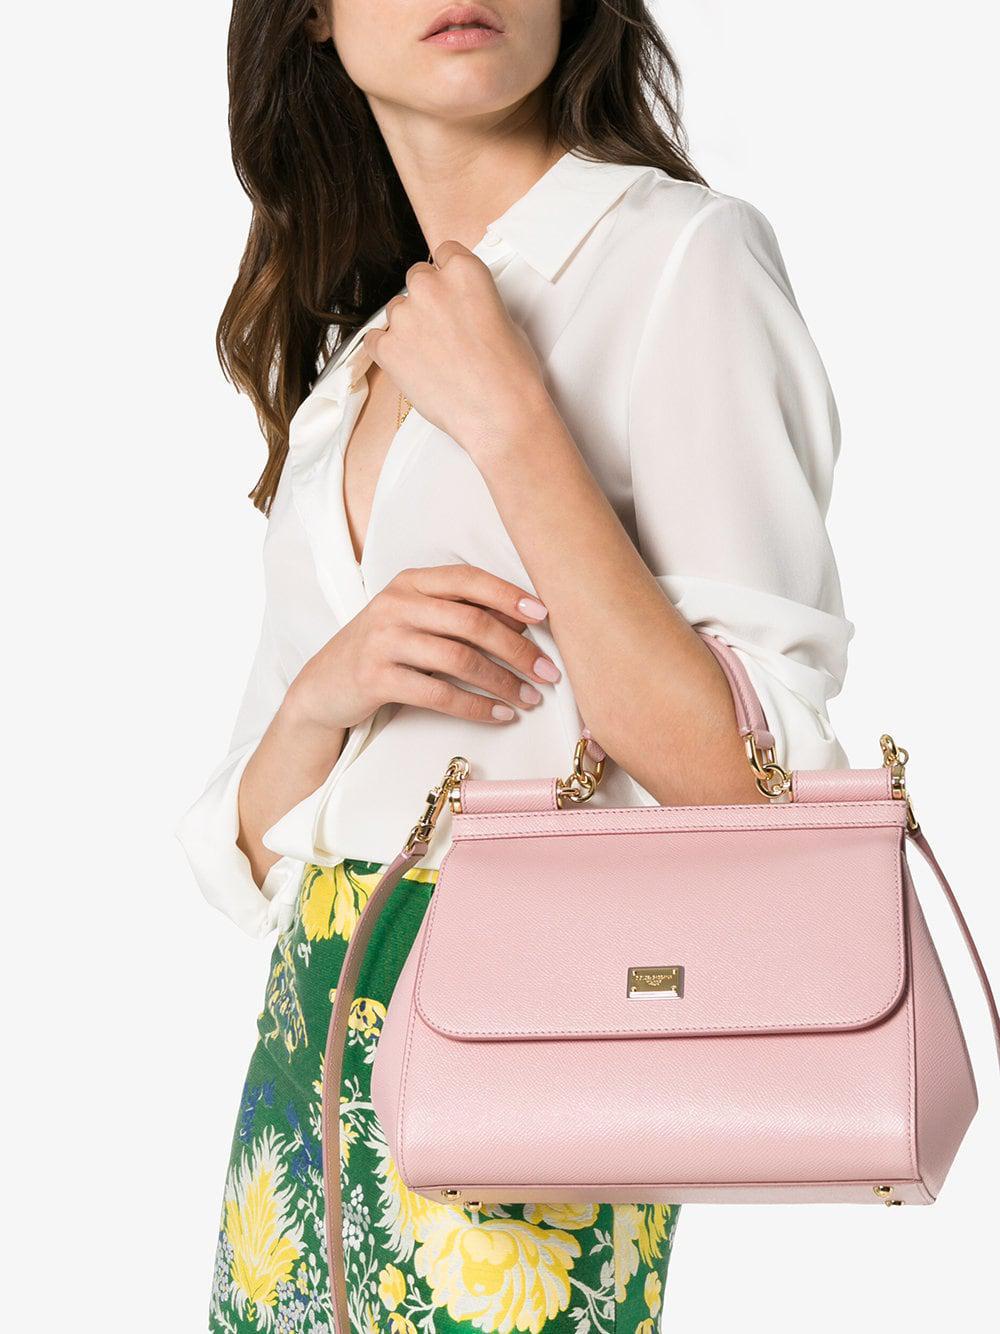 6c3d3242b11f Dolce   Gabbana - Pink Sicily Medium Leather Tote - Lyst. View fullscreen